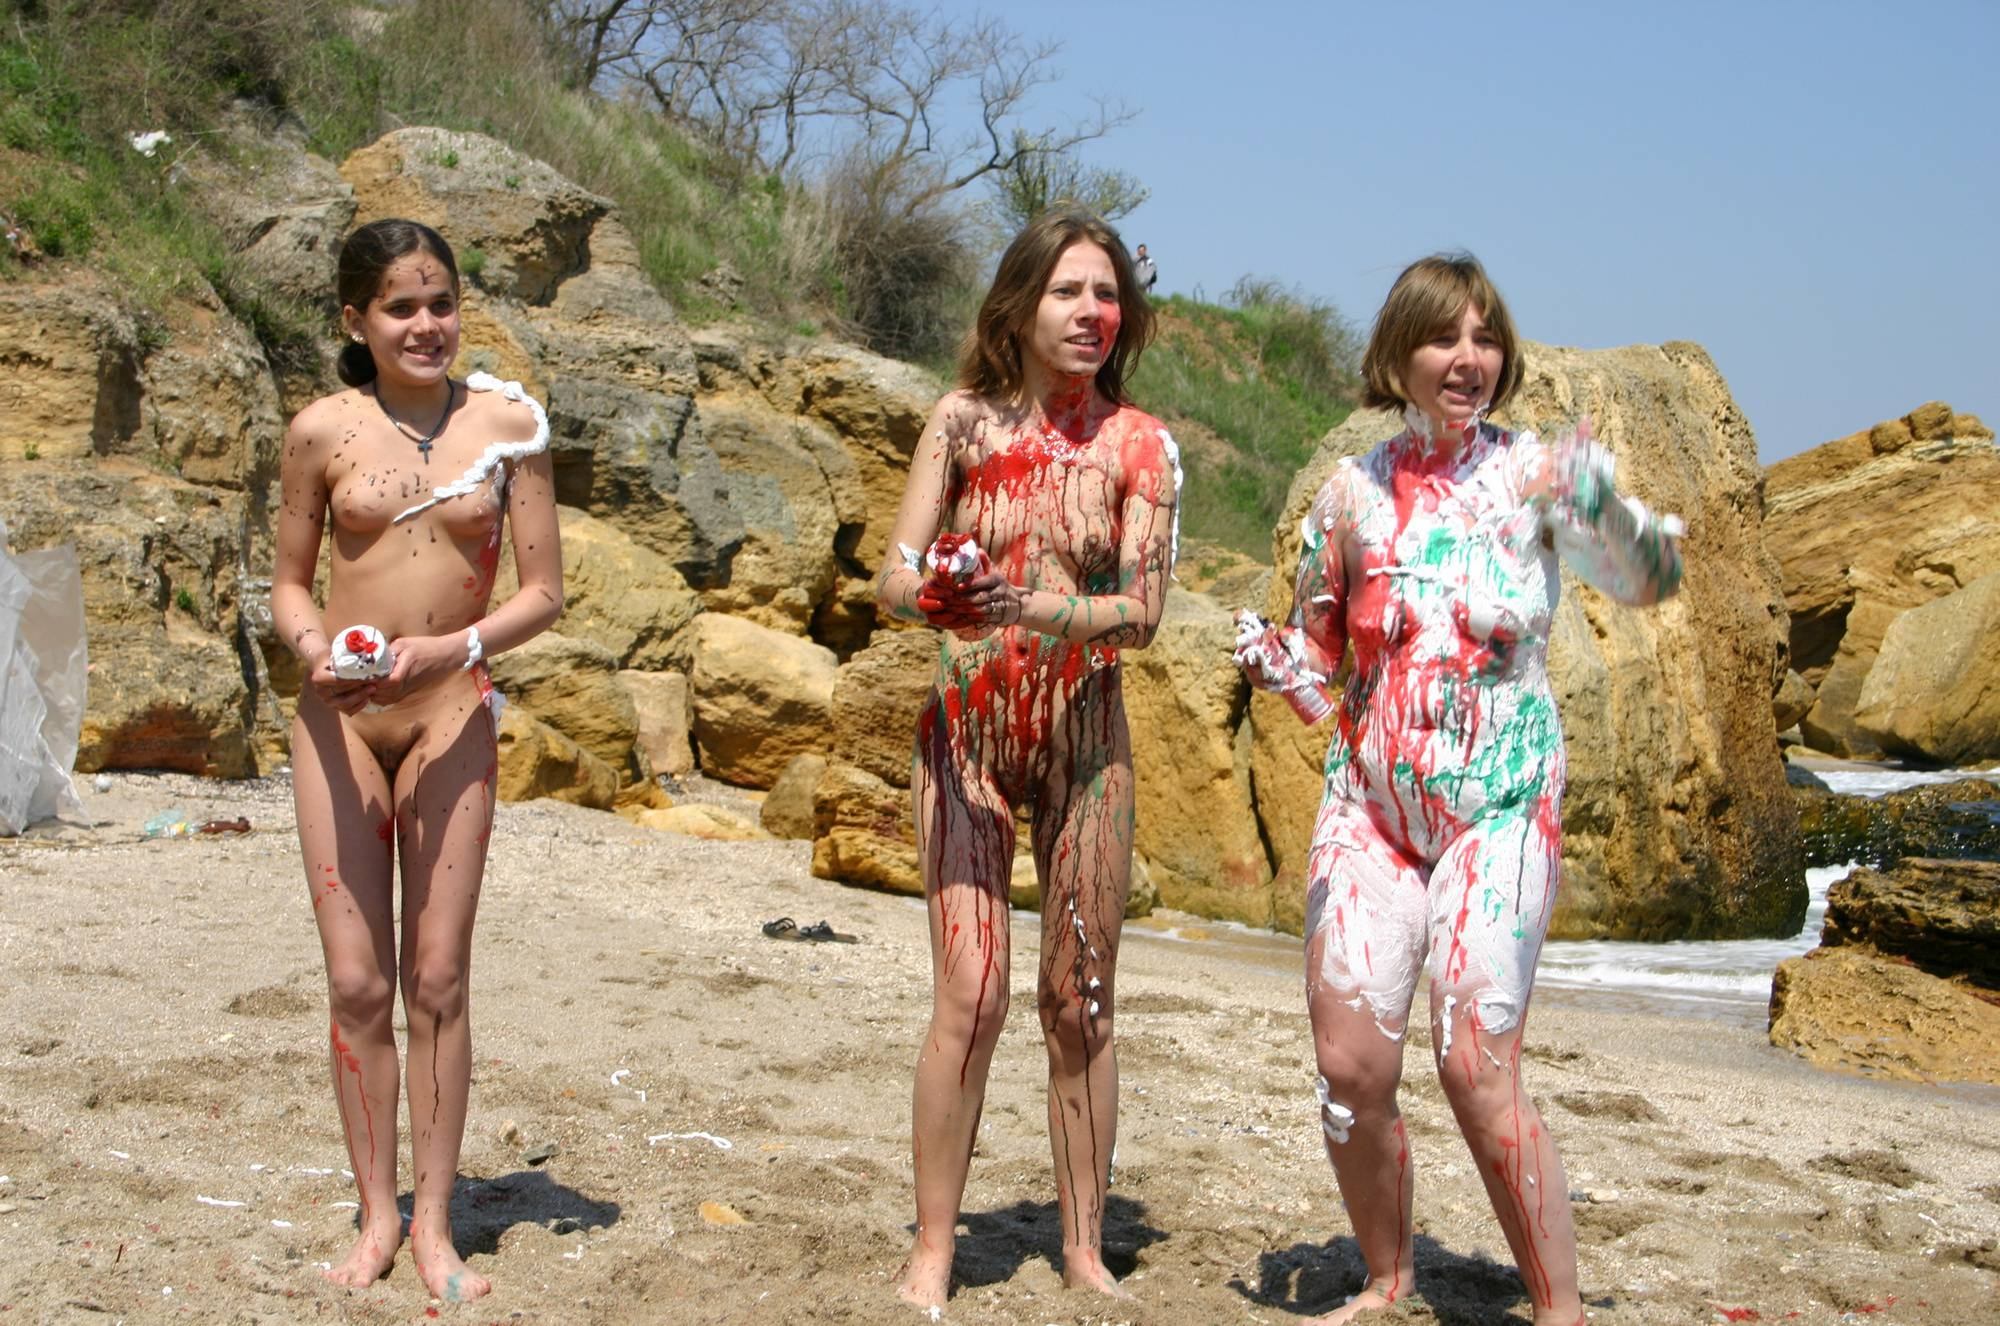 Nudist Photos Beach Paint Fight Initiation - 1